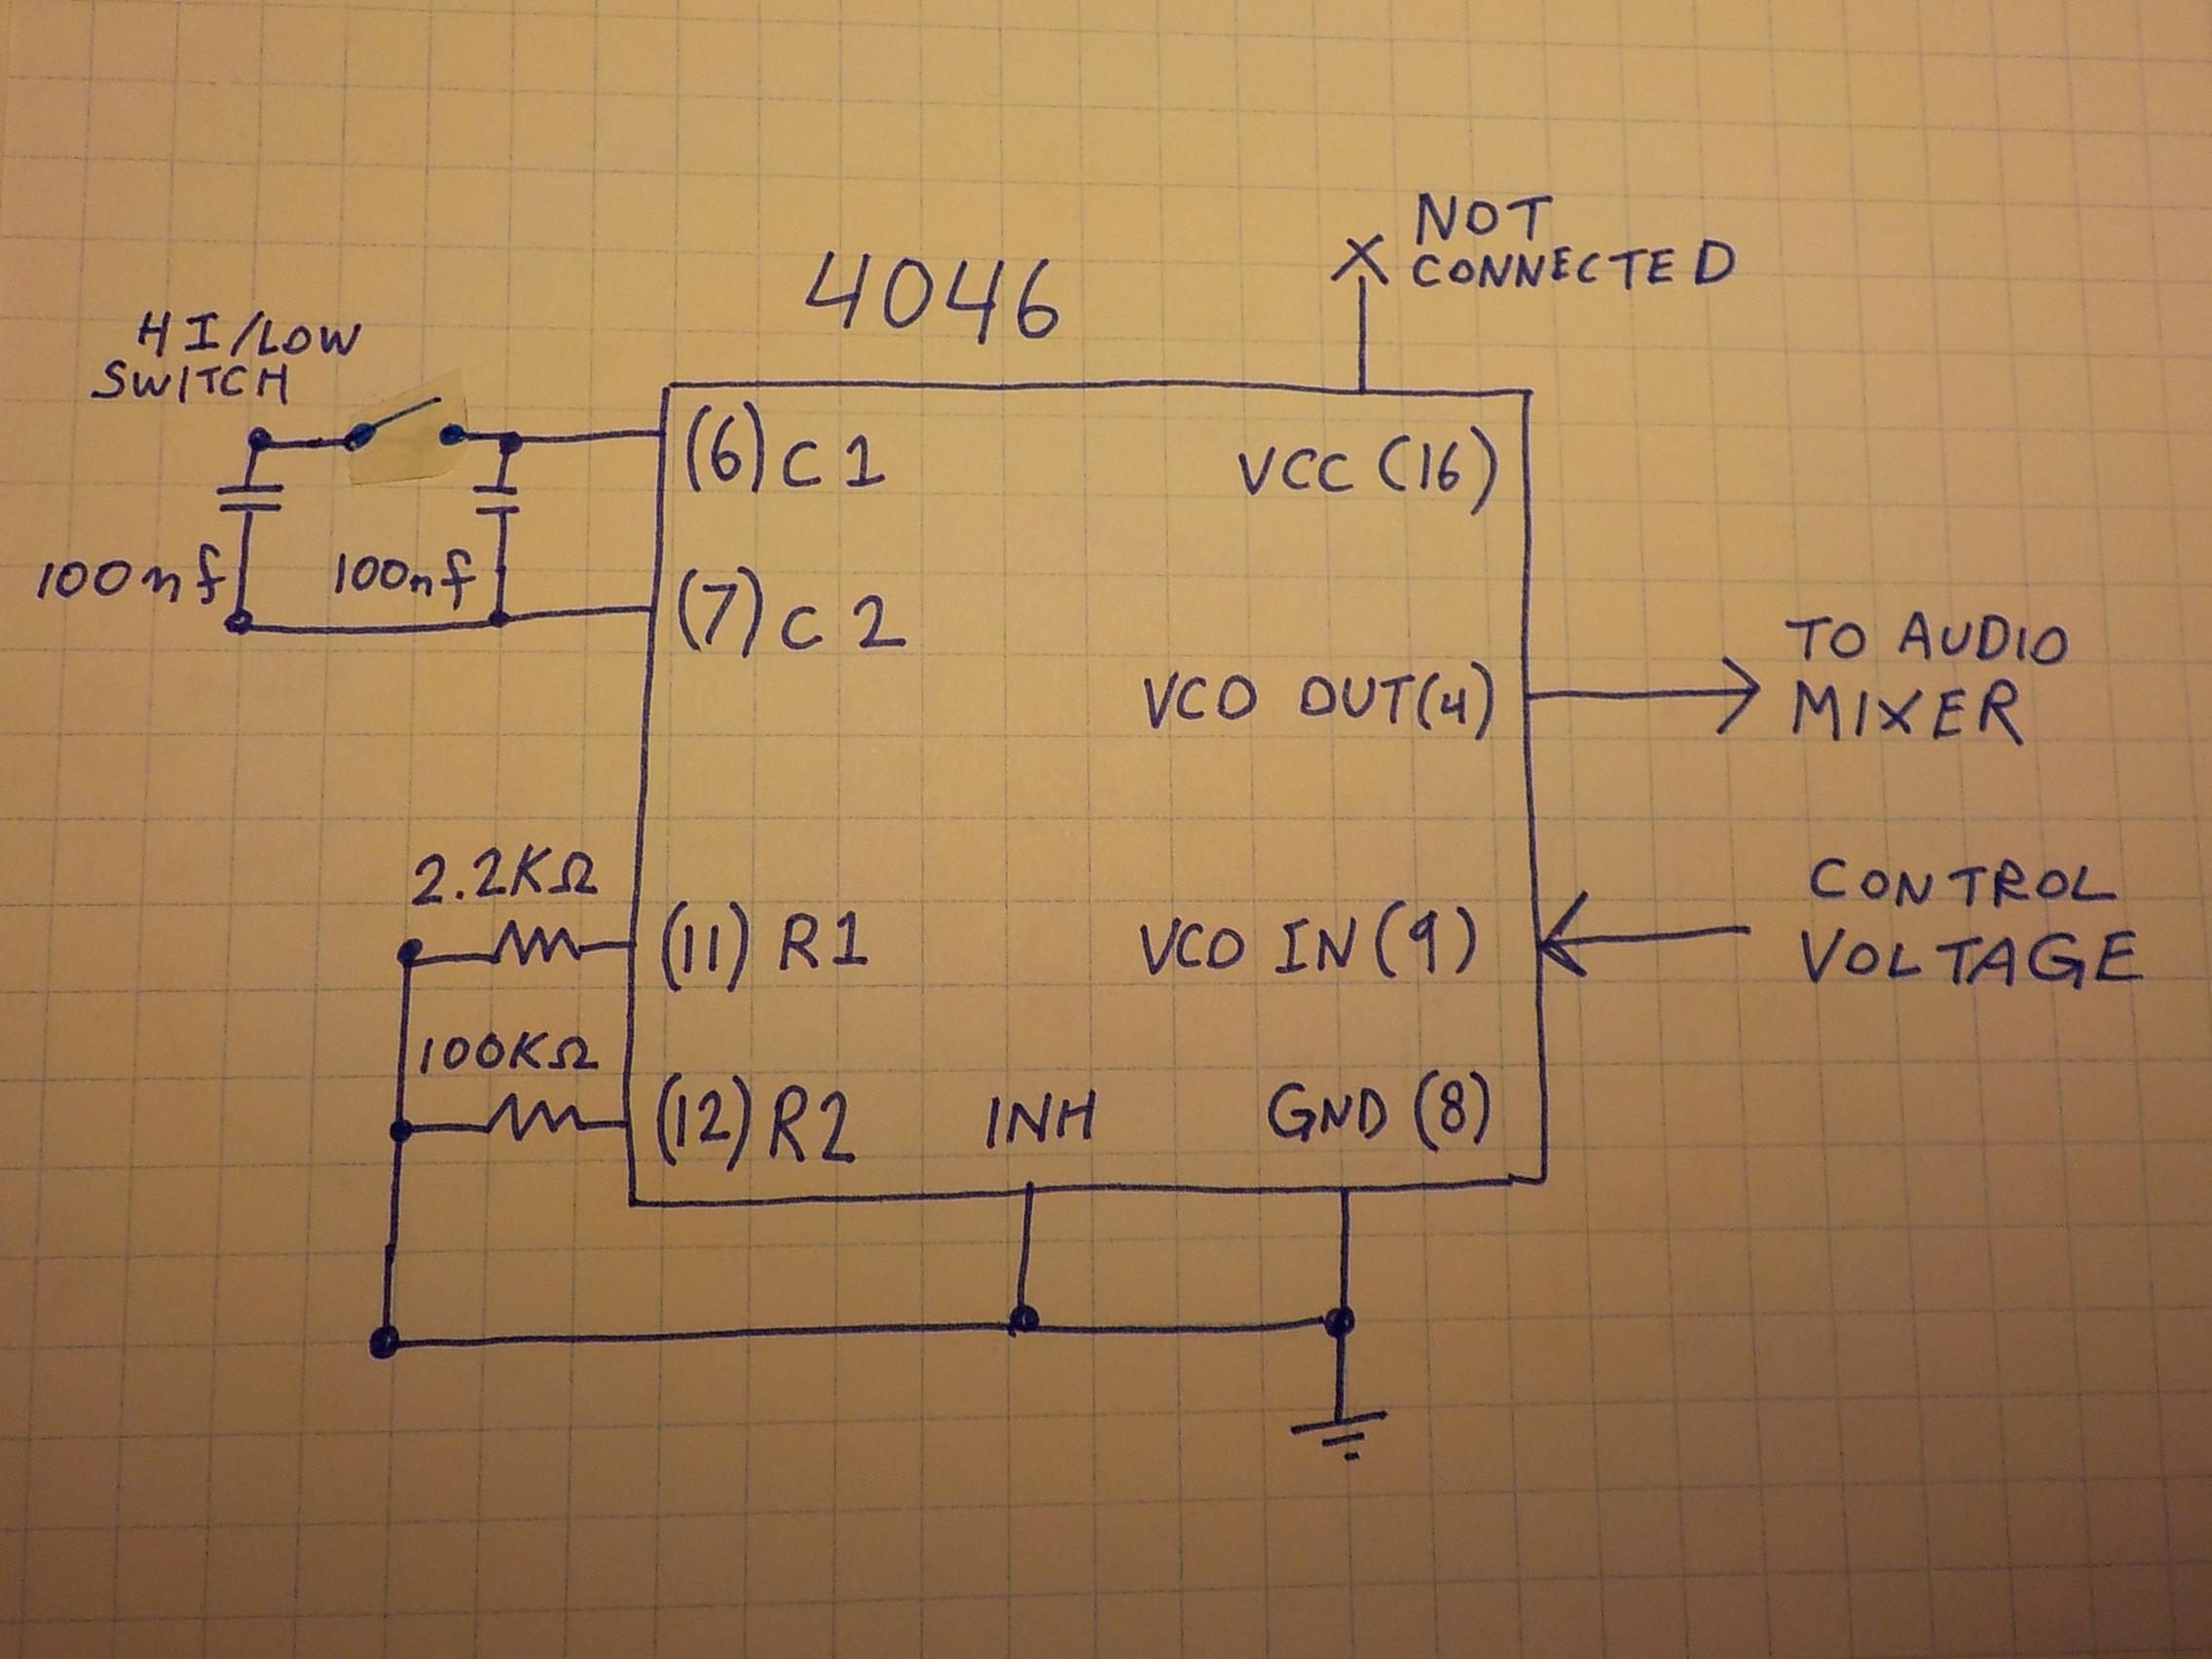 Project Zappotron Super Sequencer Audio Mixer Circuit Bad 4046